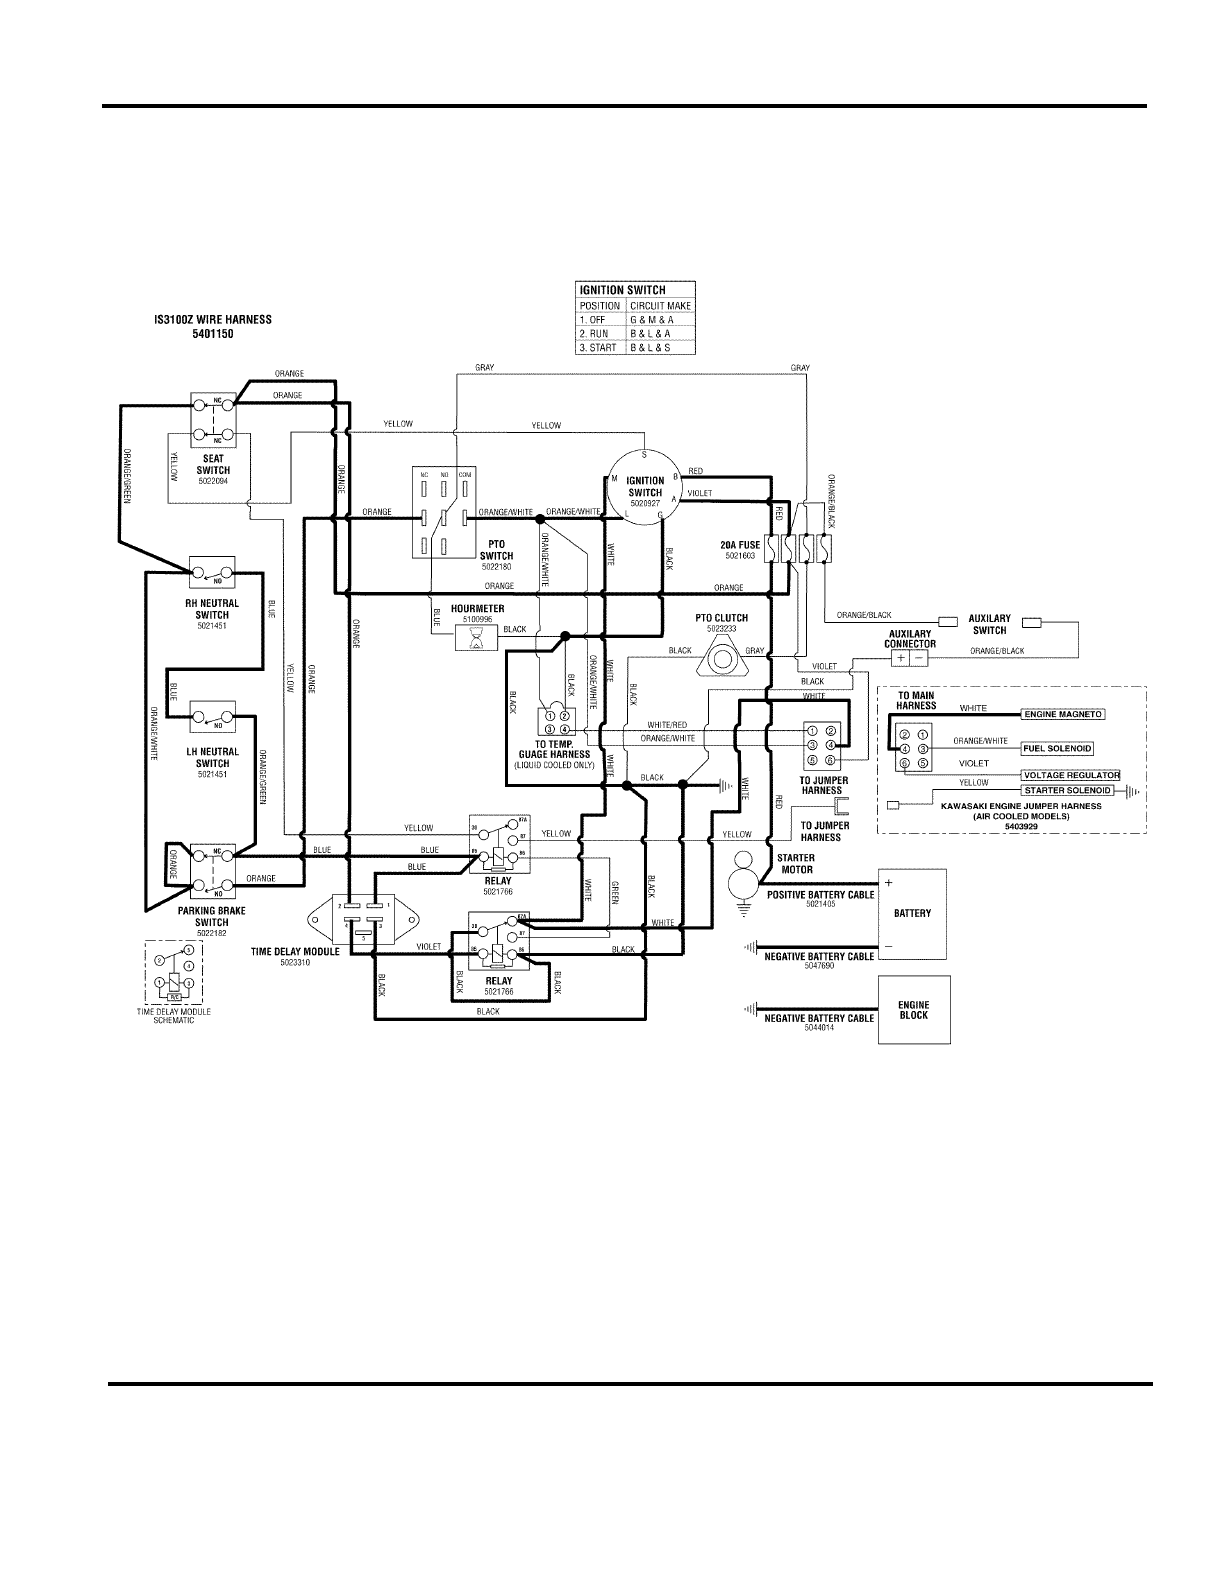 Silk Screen Flash Dryer Wiring Diagram Complete Diagrams Ferris Schematics U2022 Rh Seniorlivinguniversity Co Amana Roper